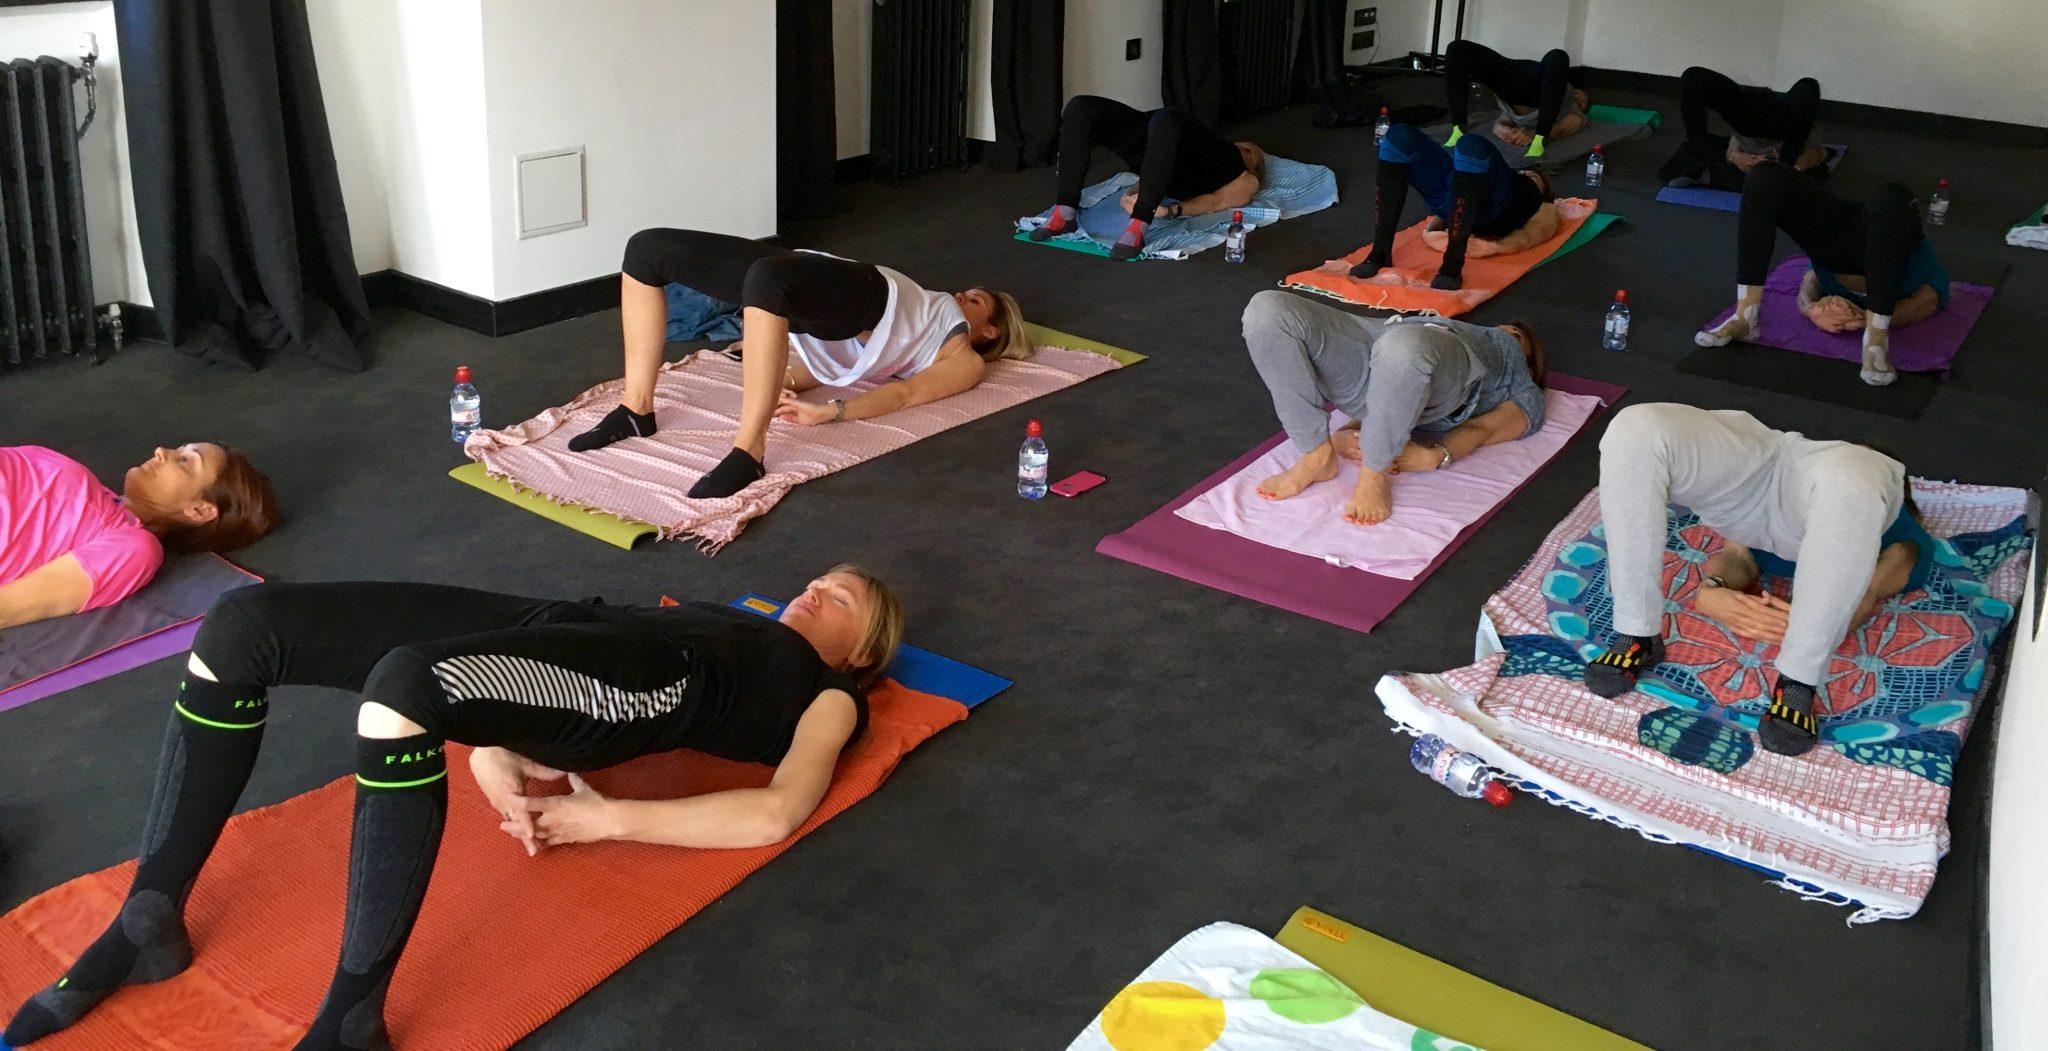 groupe-skieuses-journée-femme-yoga